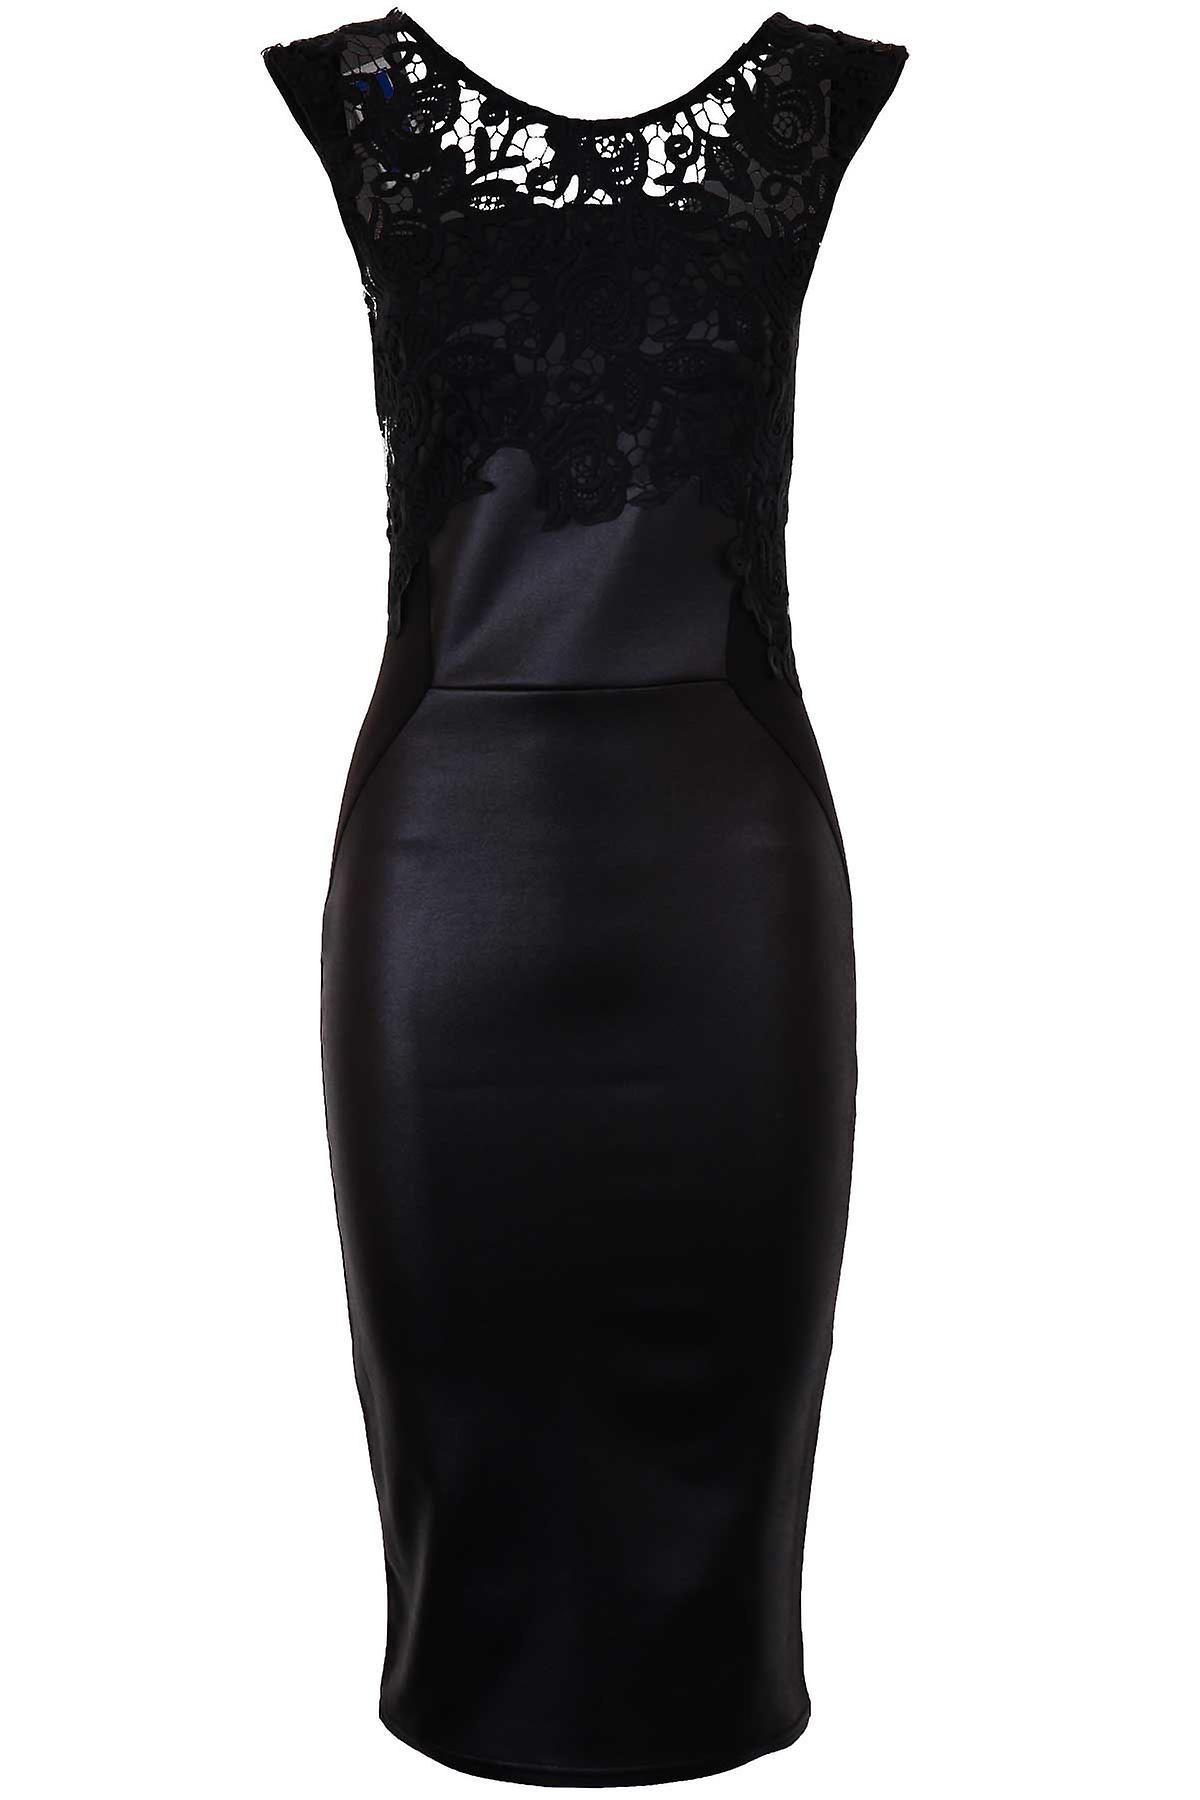 Ladies Celeb Michelle Wetlook PU Lace Trim Crochet Slim Bodycon Women's Dress